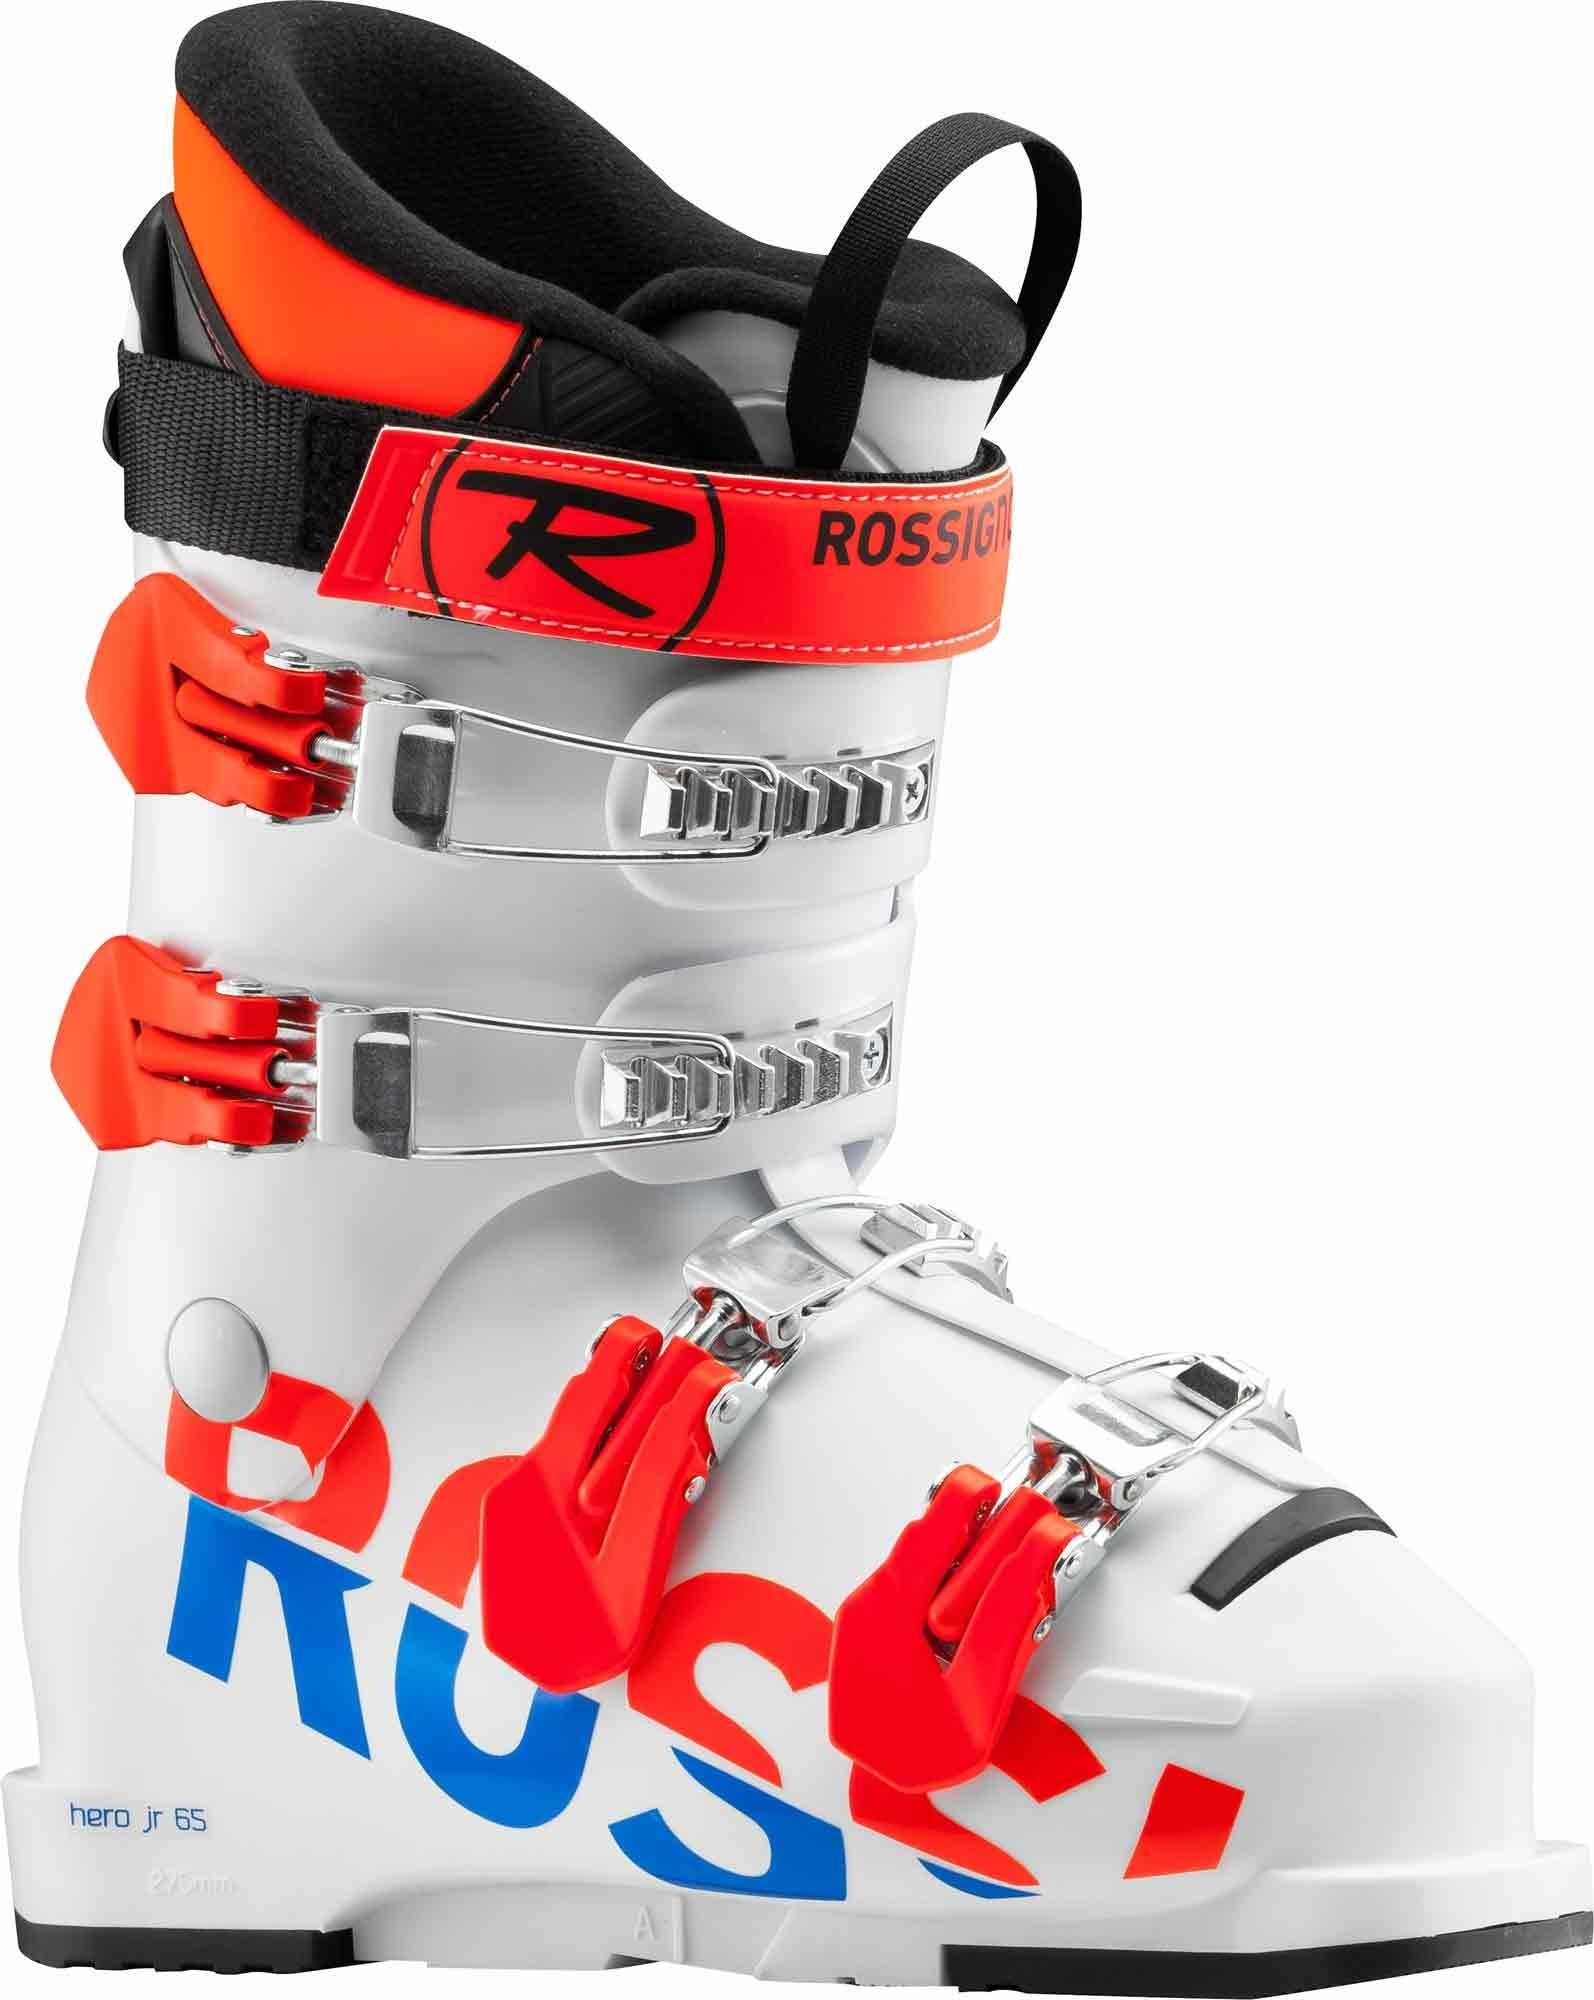 WHITE Ski SC de chaussures HERO de 70 sur ROSSIGNOL ski Précision WC nvw0ymN8O